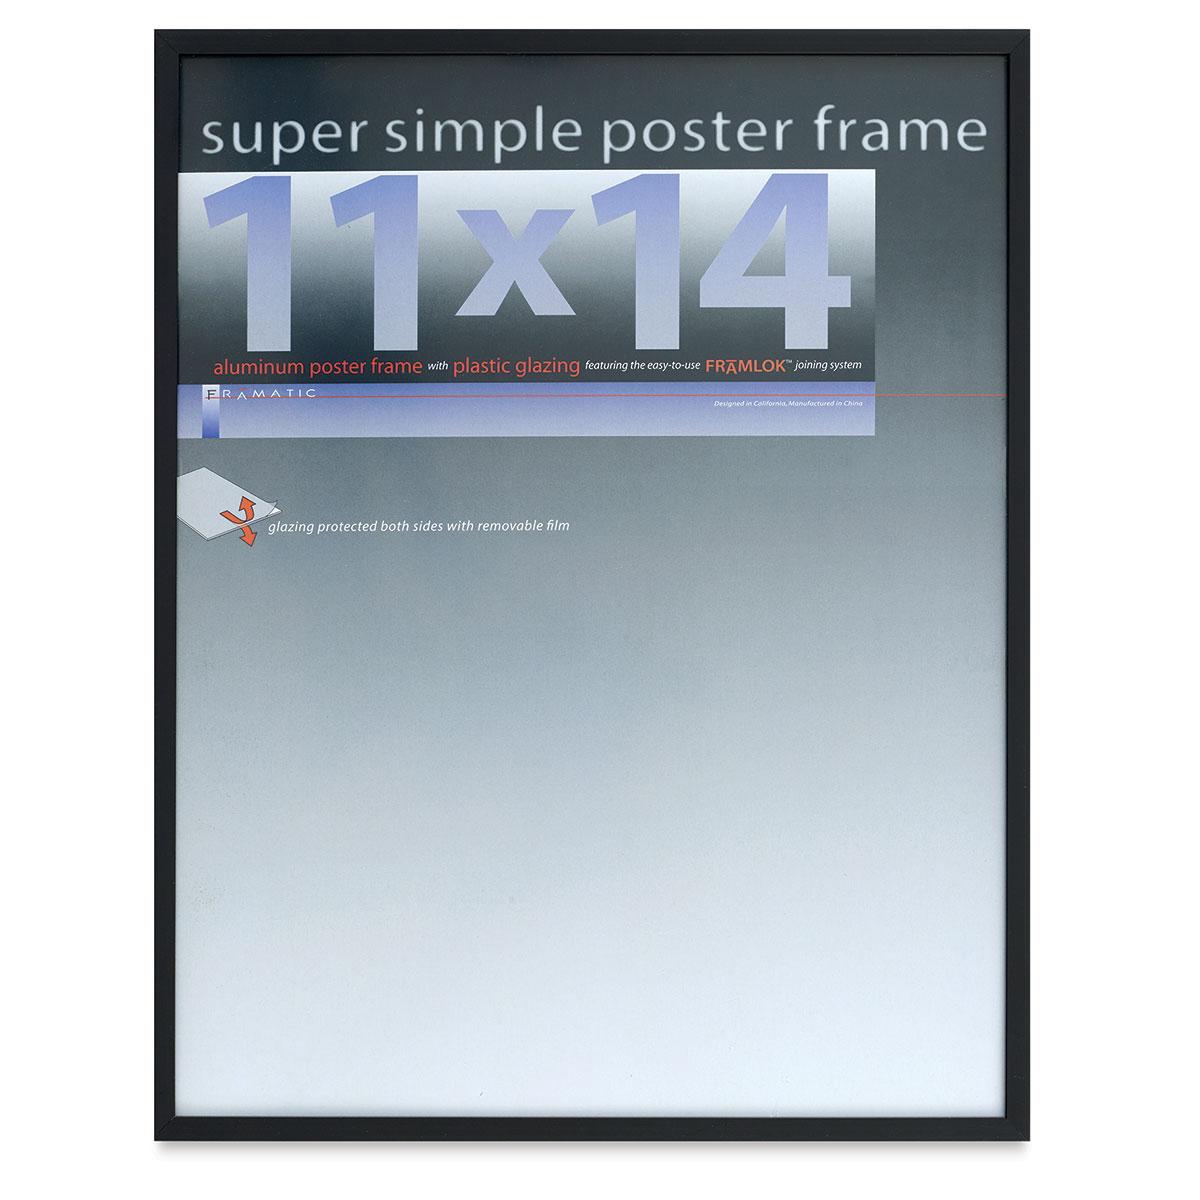 Framatic Super Simple Poster Frame - Black, 11 x 14